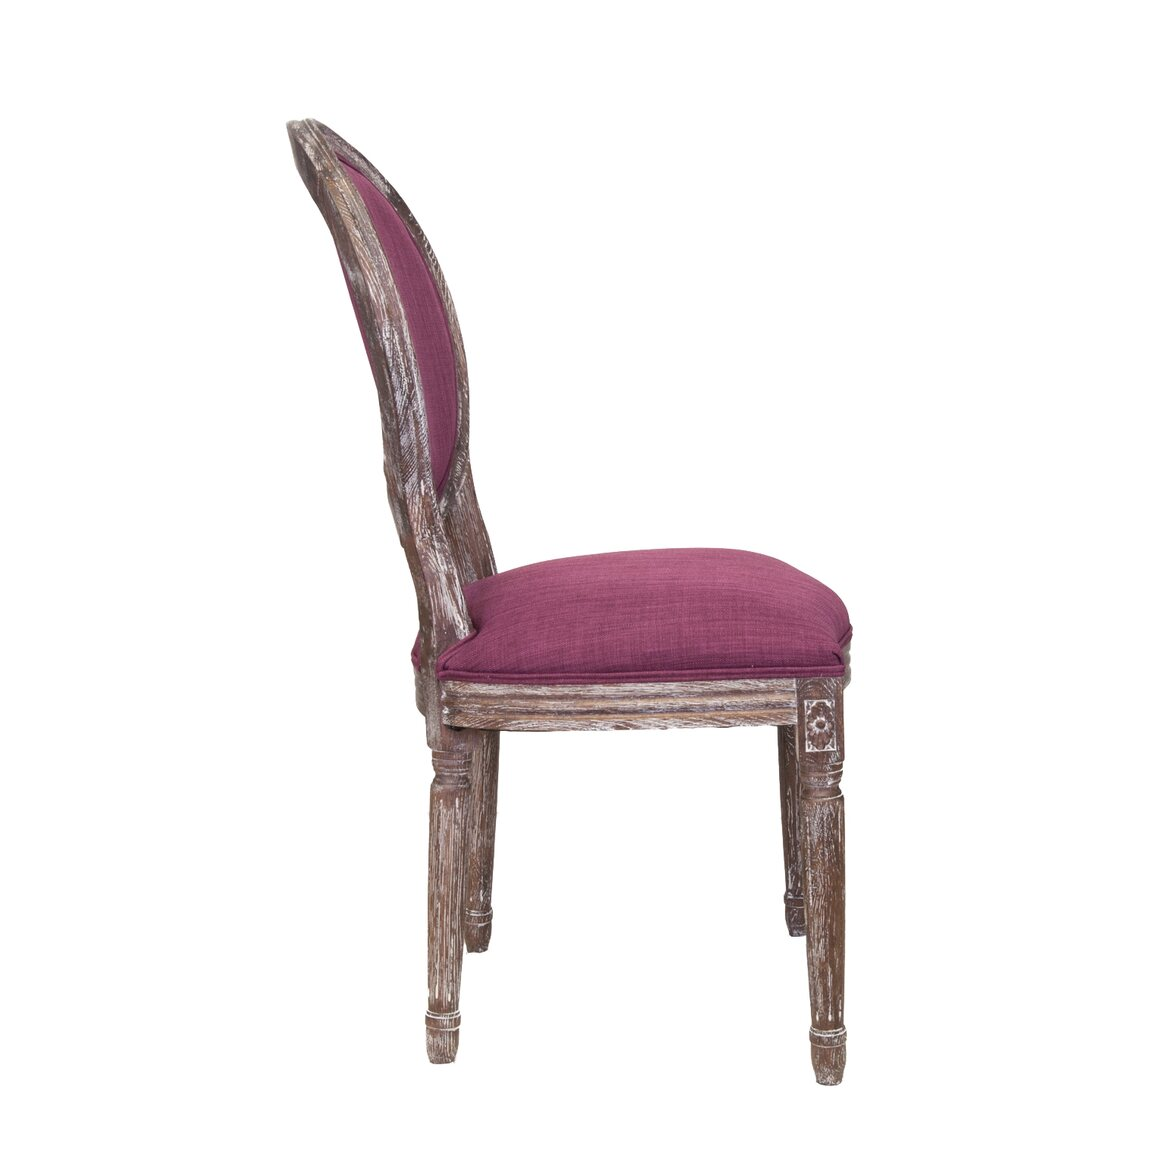 Стул Miro violet 3 | Обеденные стулья Kingsby